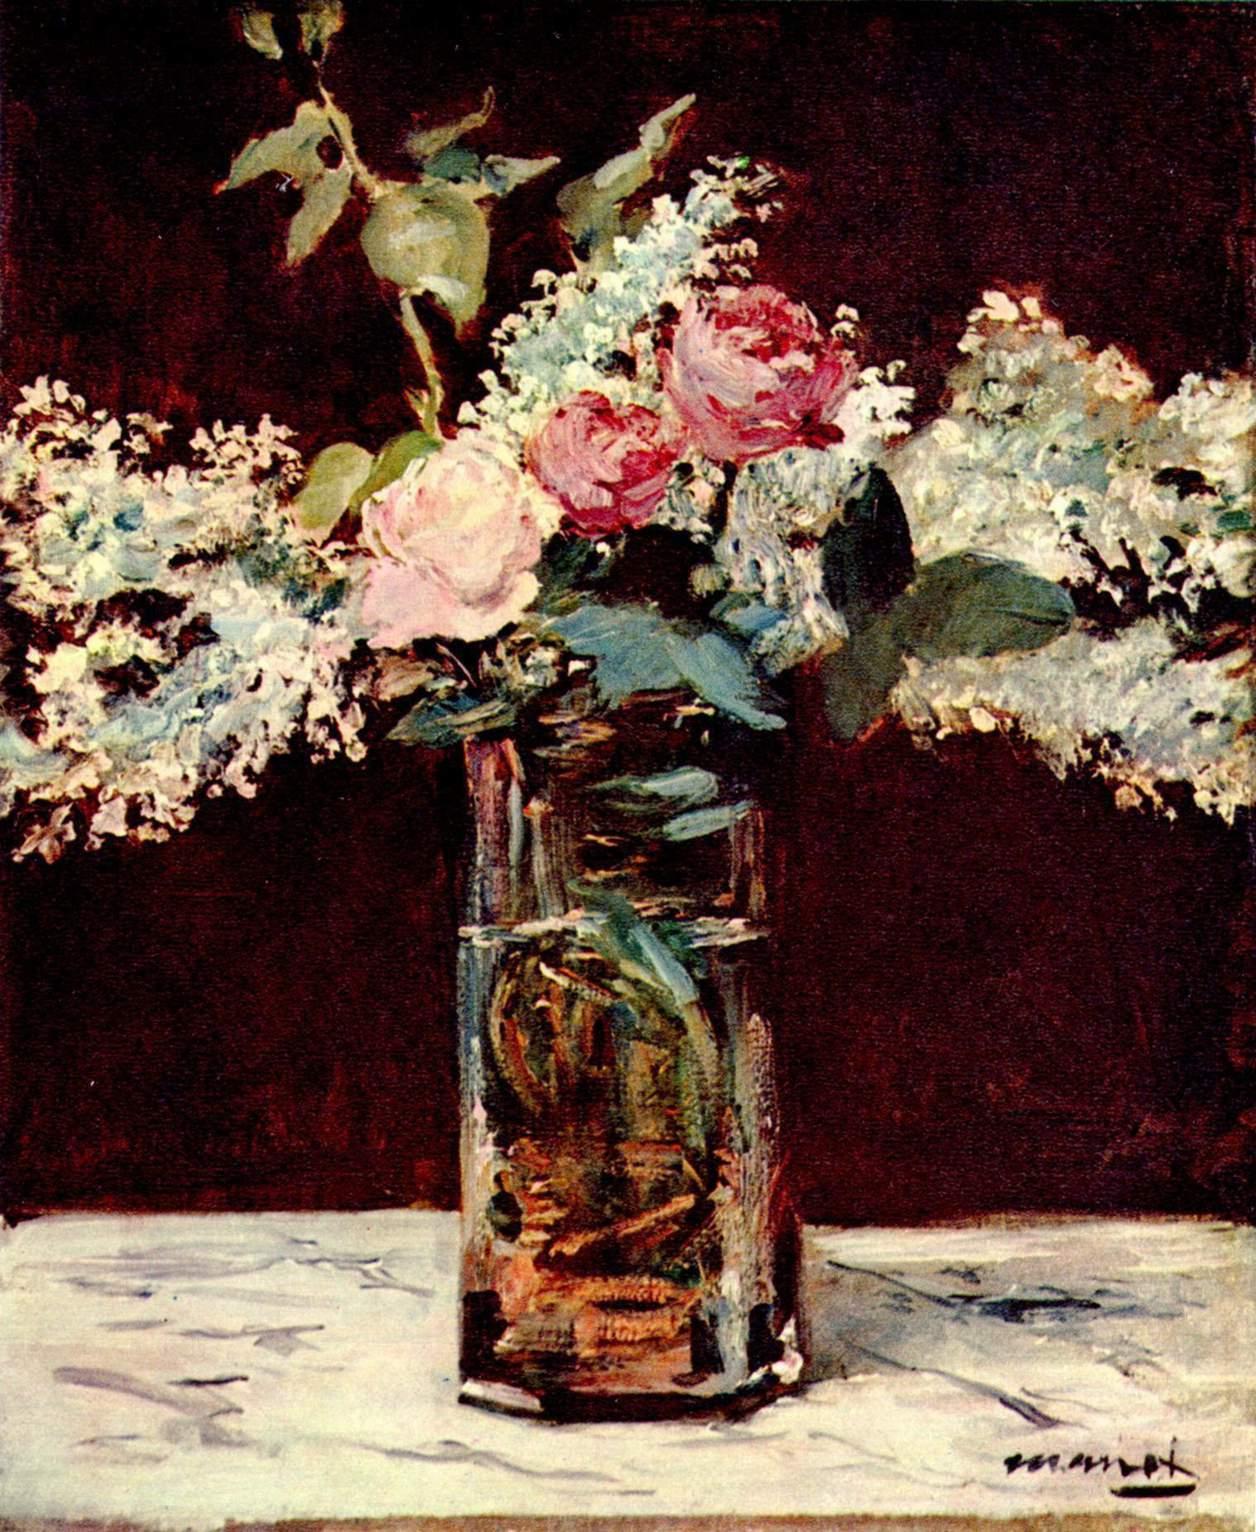 Édouard Manet - Still Life, Lilacs and Roses, 1883